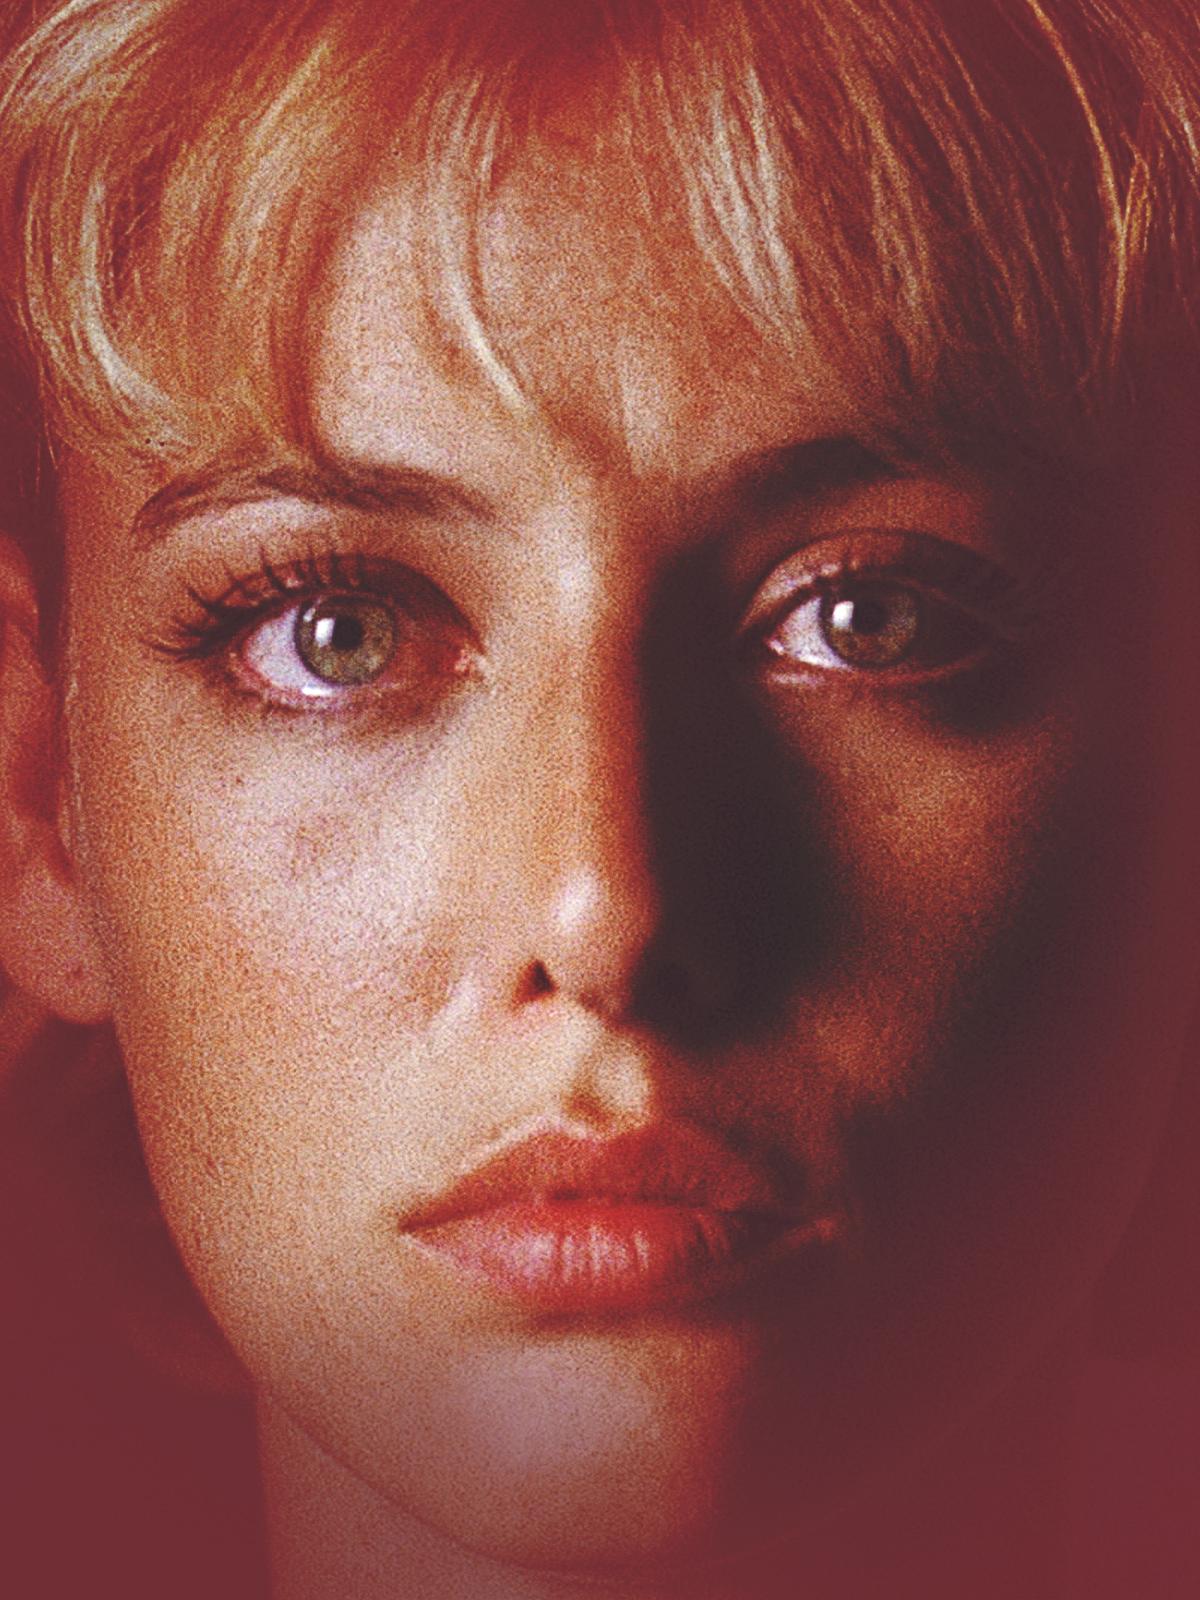 Virginia Madsen in A Murderous Affair: The Carolyn Warmus Story (1992)